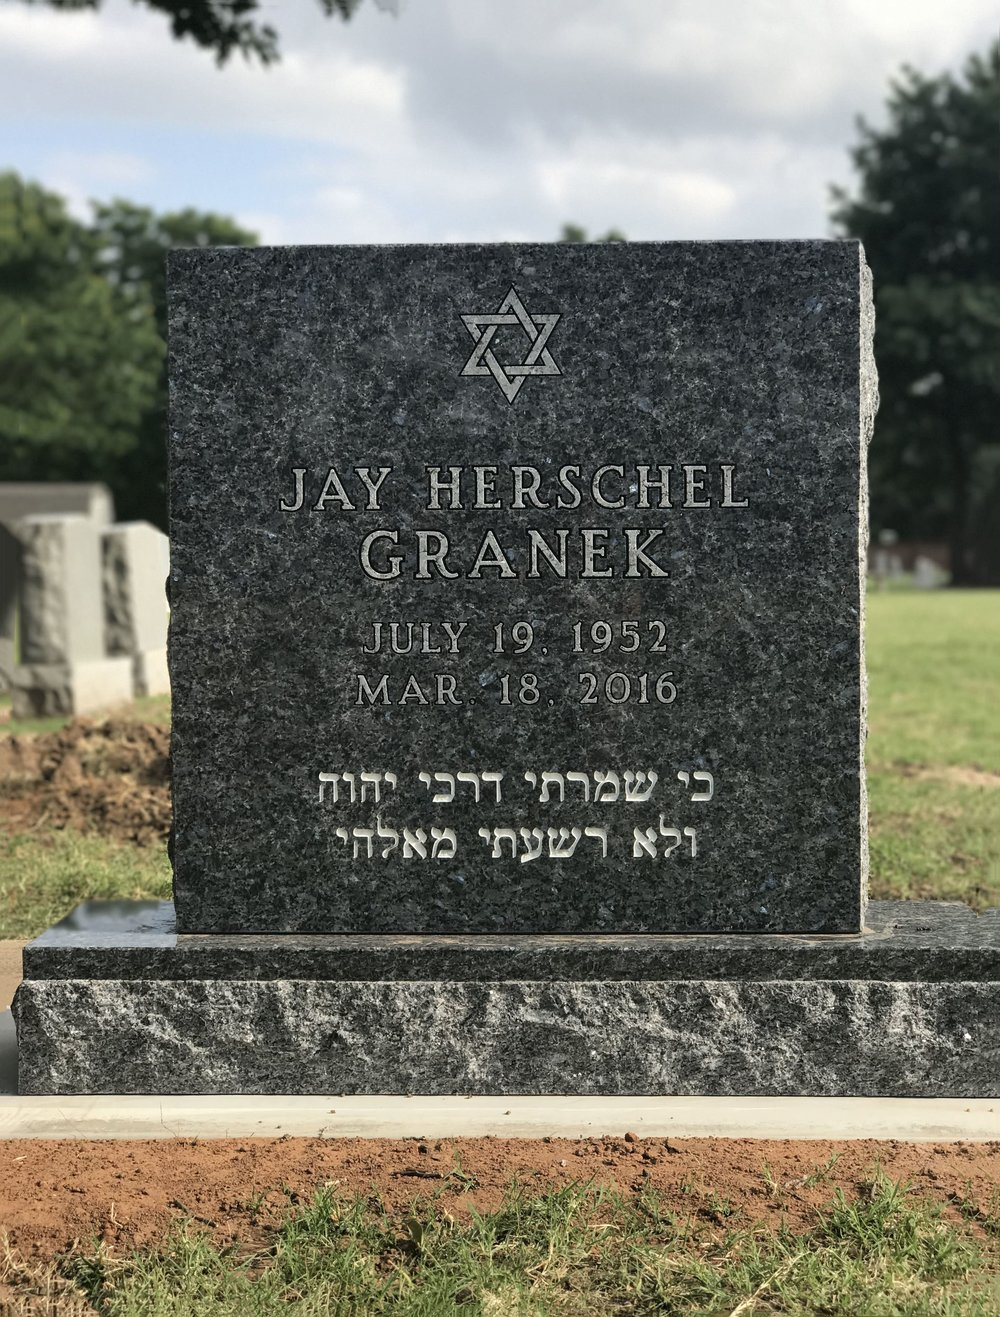 38. Emanuel Synagogue Cemetery